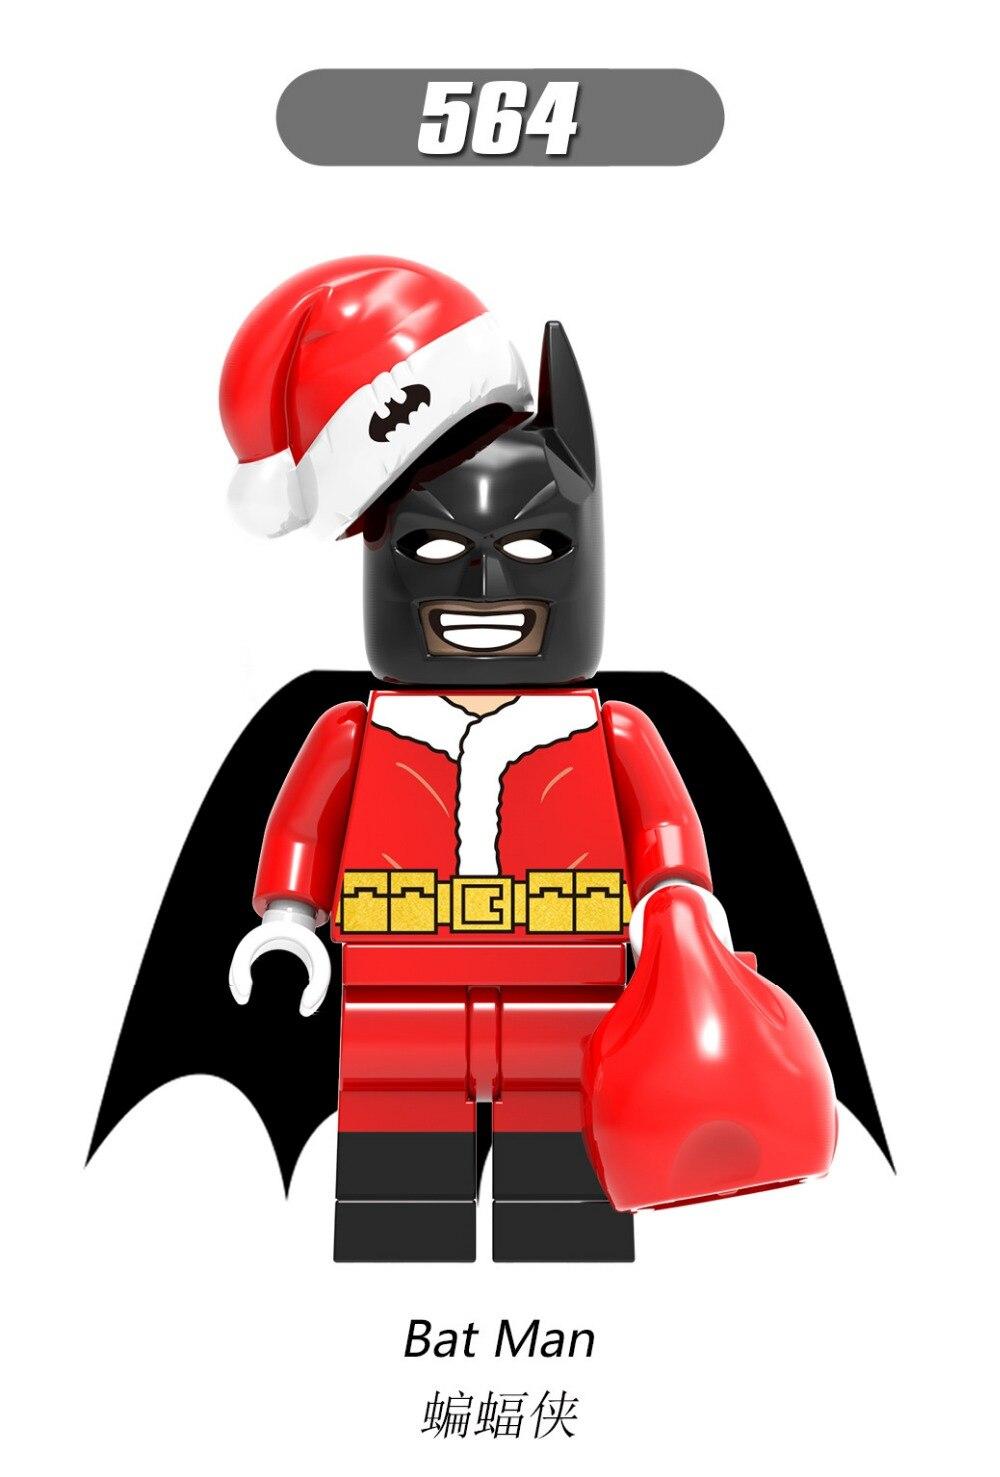 Batman Christmas.Us 32 0 Sn 50pcs Xh564 Batman Wiley Super Heroes Merry Christmas Boy Joker Jango Fett Building Blocks Bricks Legao Toys X0154 In Blocks From Toys